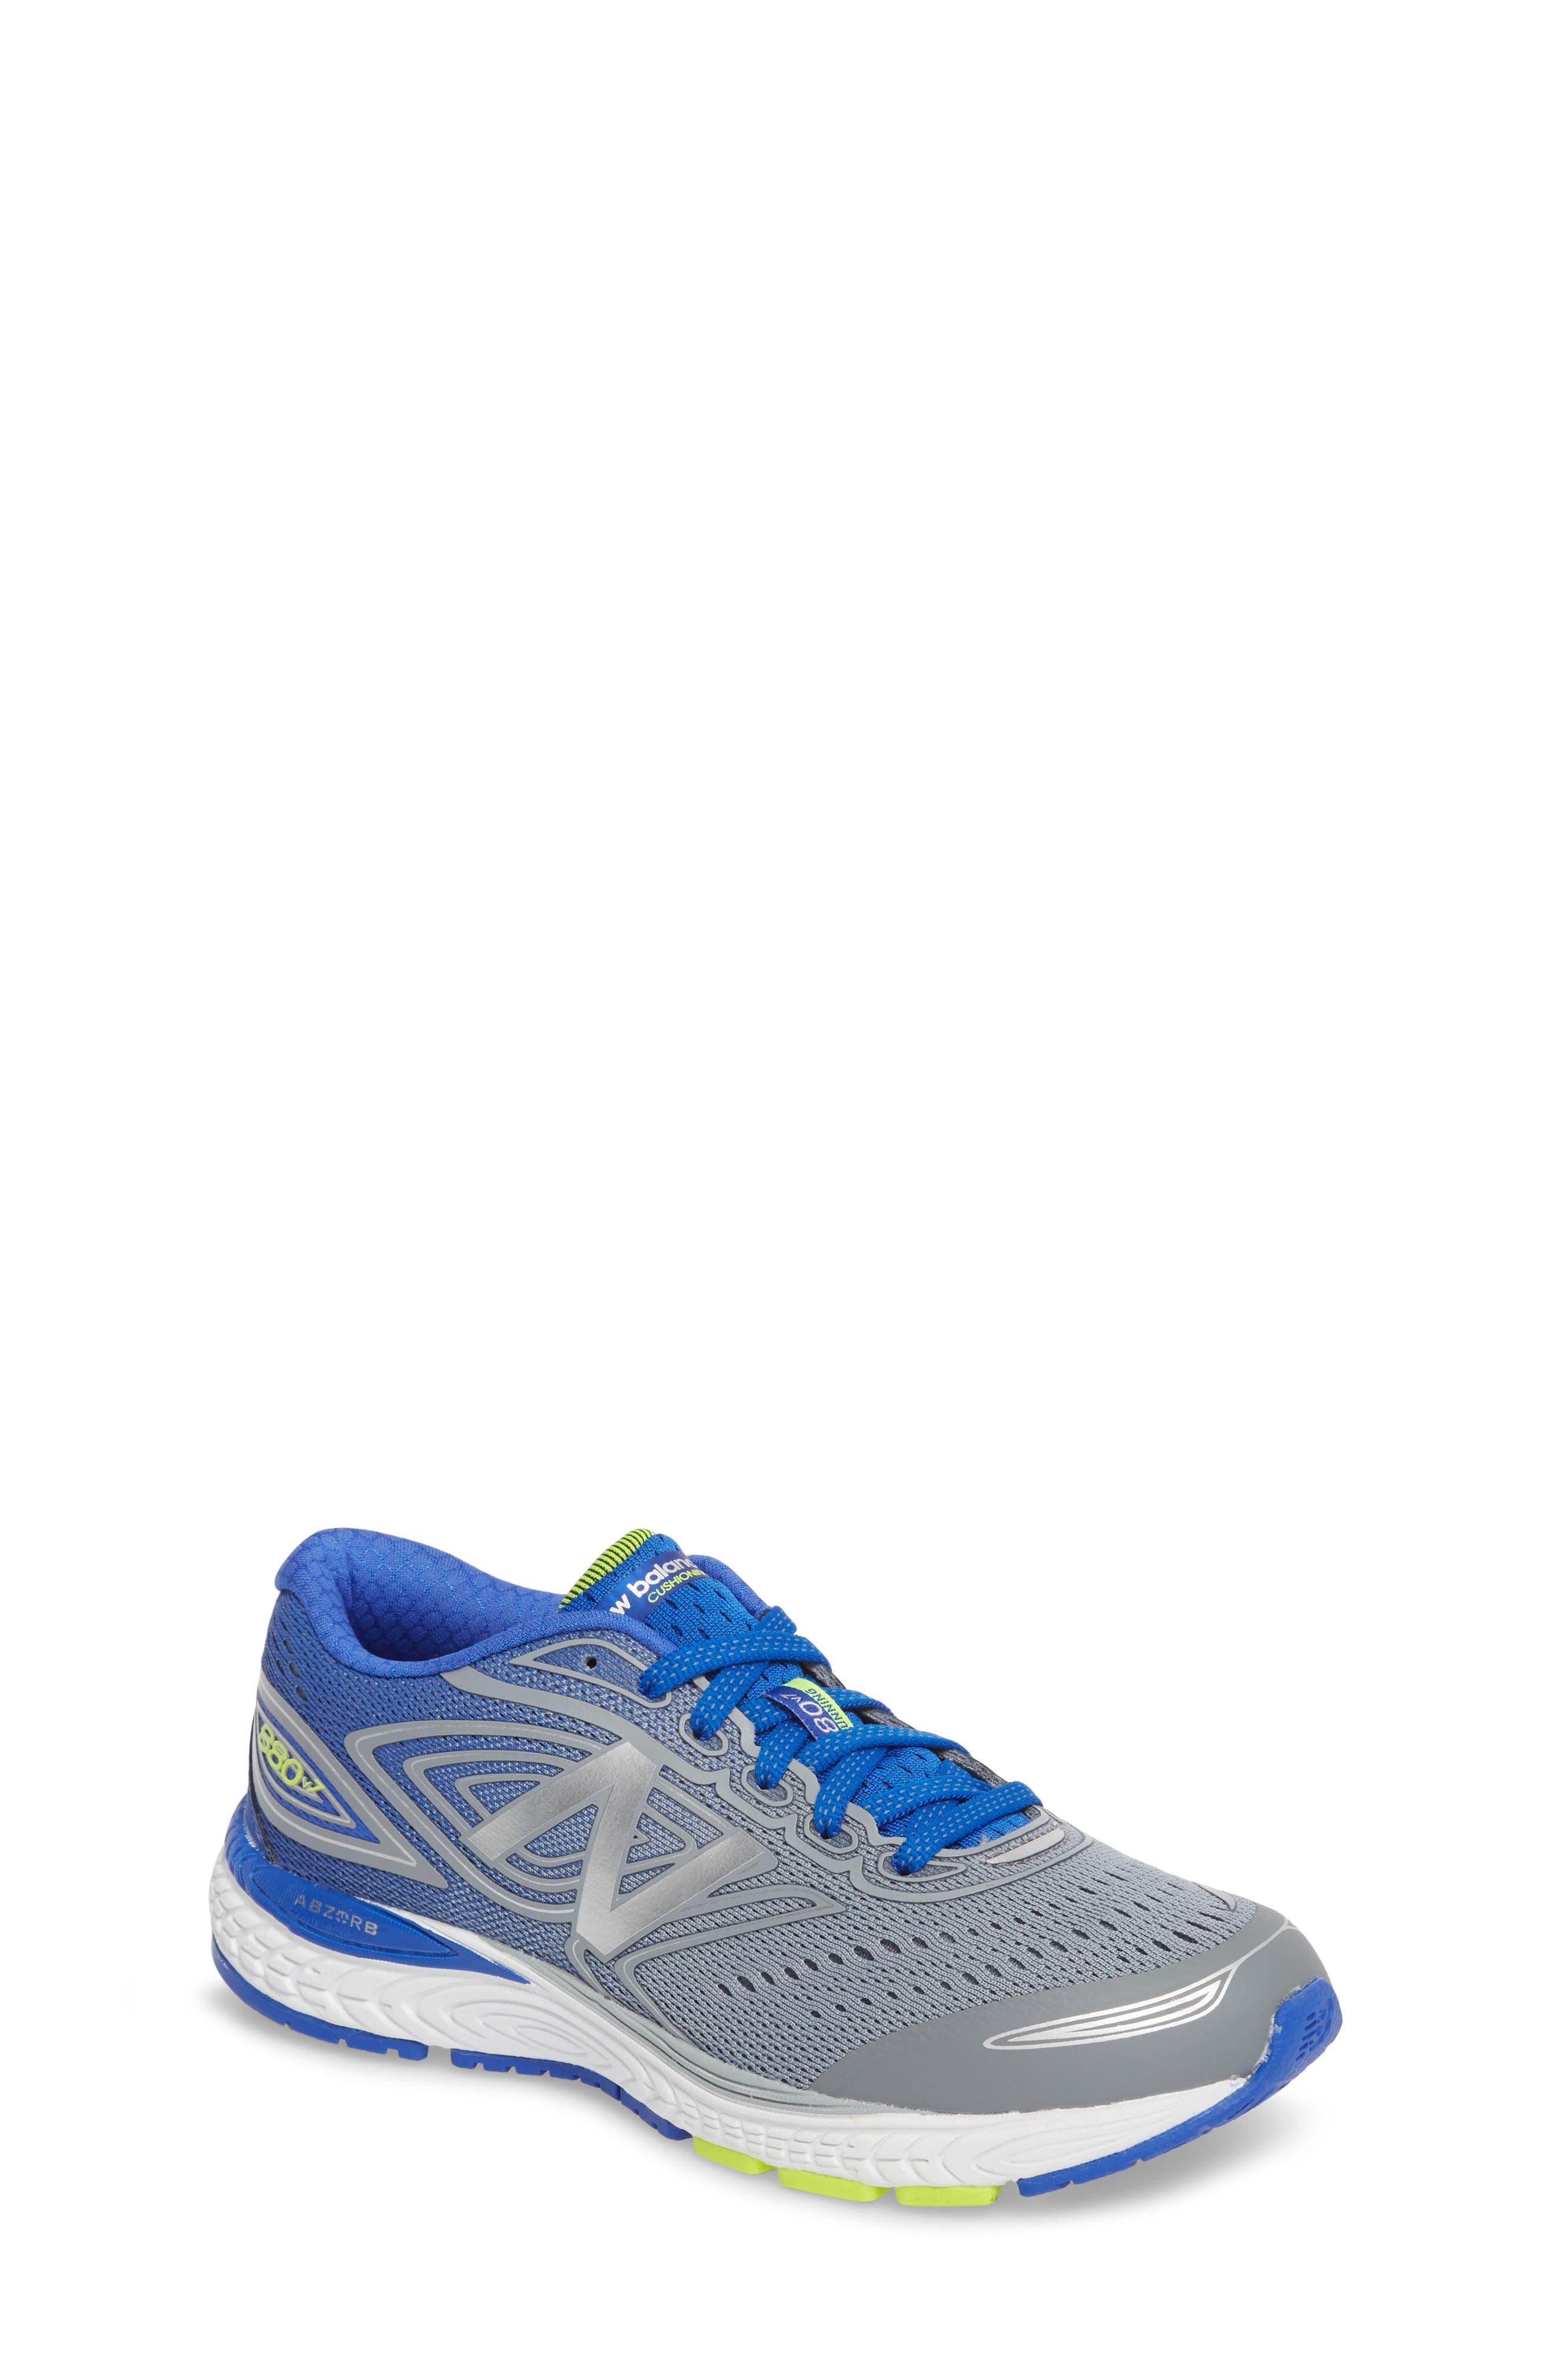 Boys New Balance 880V7 Sneaker Size 125 M  Grey